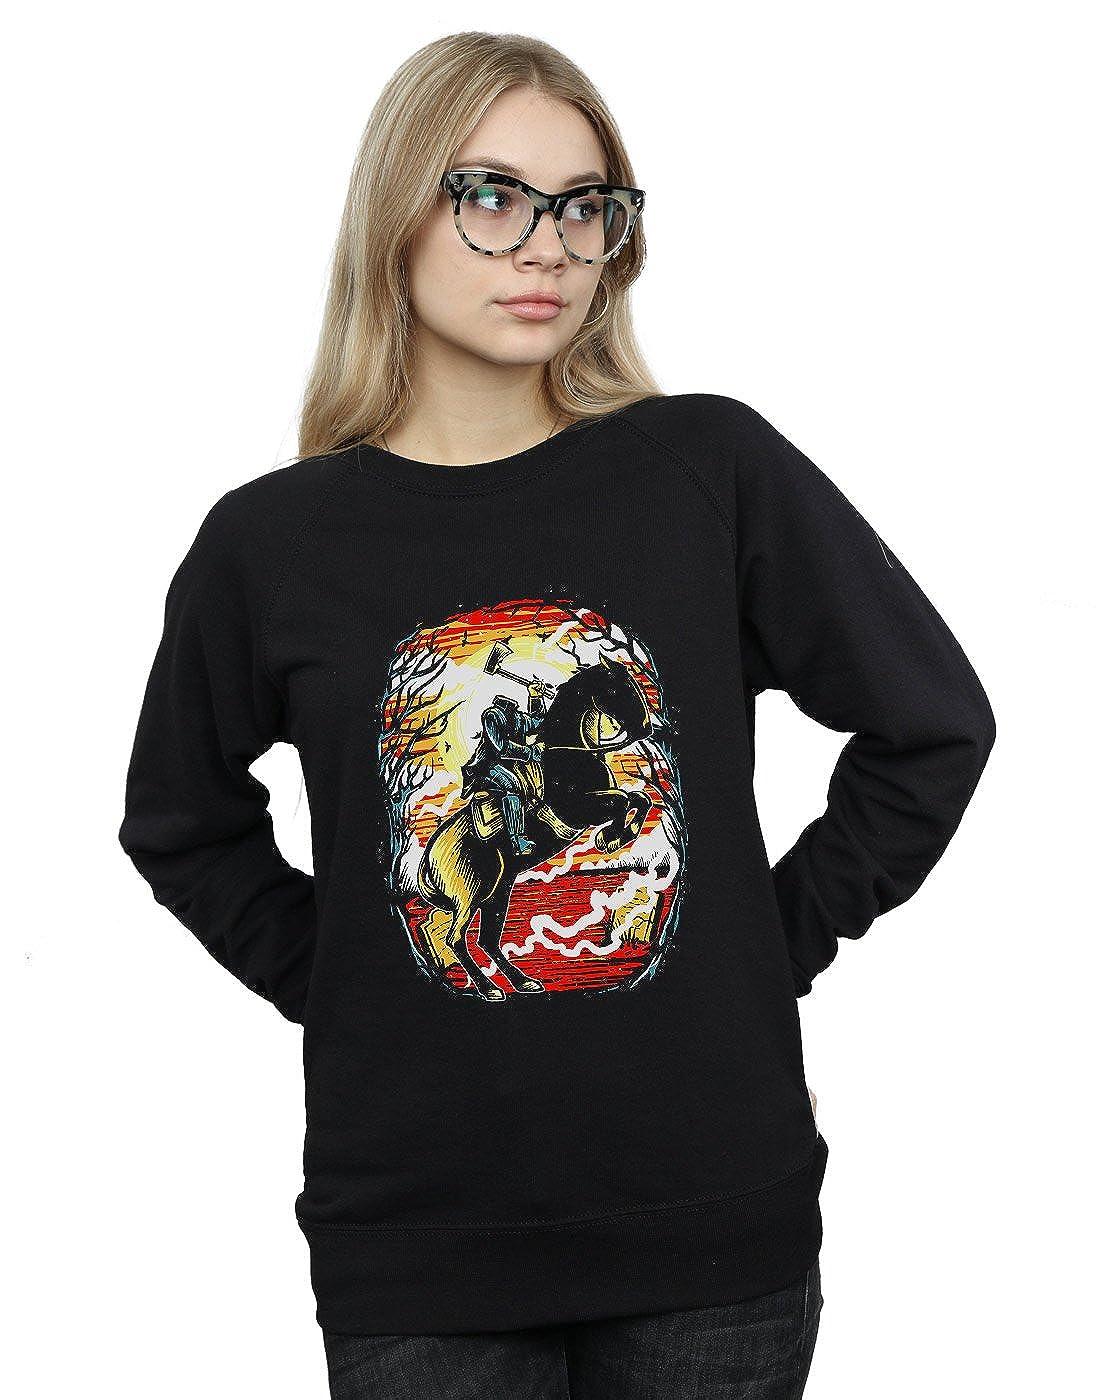 Absolute Cult Drewbacca Mujer Headless Horseman Camisa De Entrenamiento